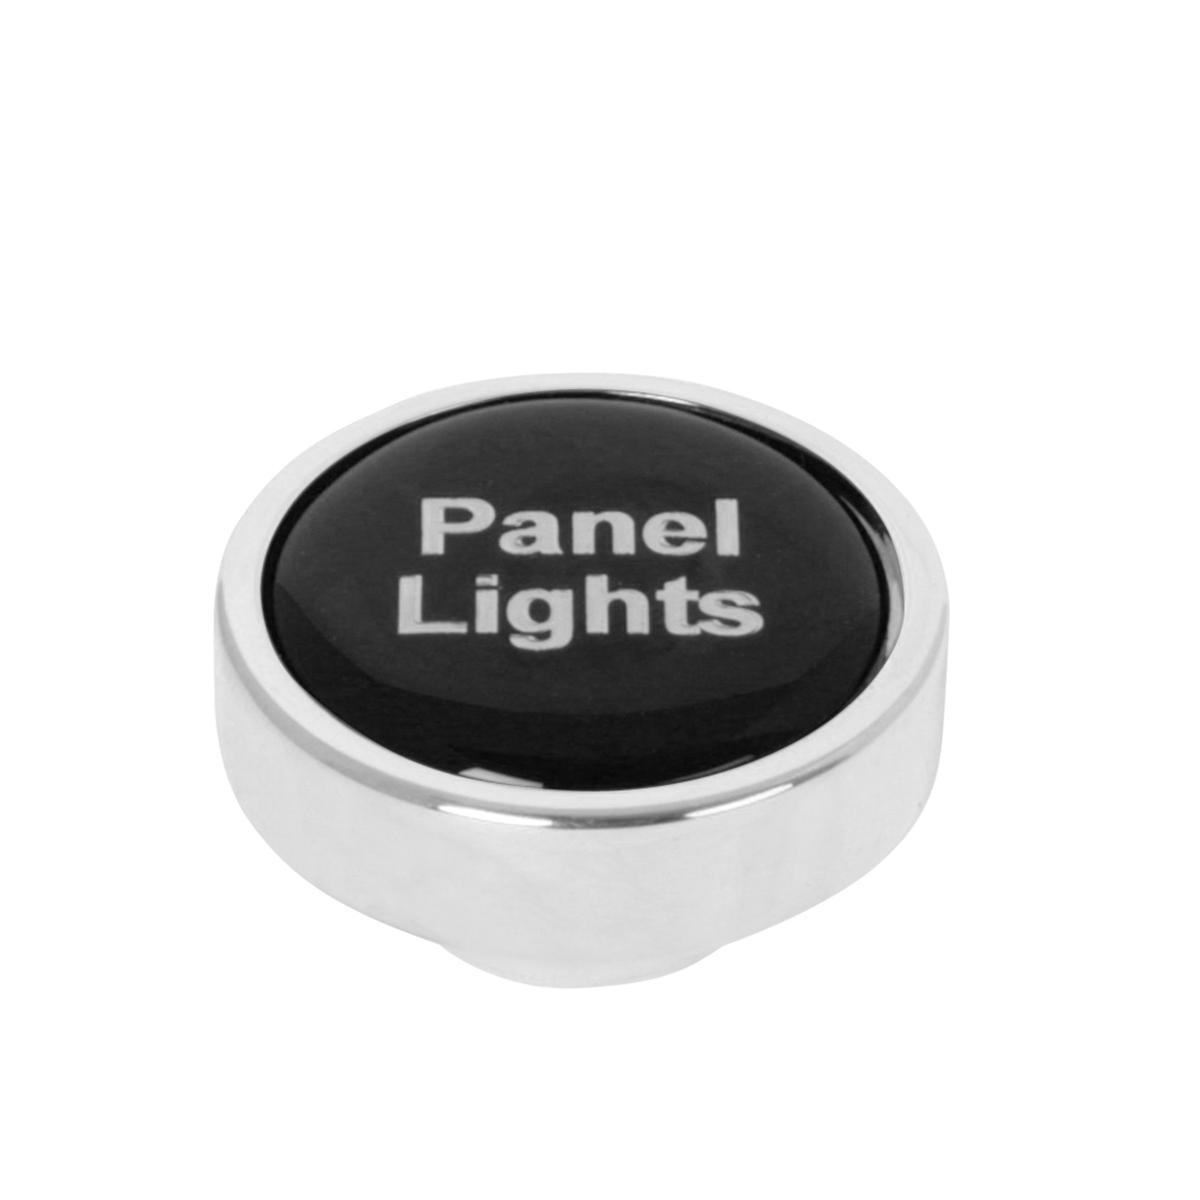 96300 Dashboard Control Knob w/ Panel Lights Script